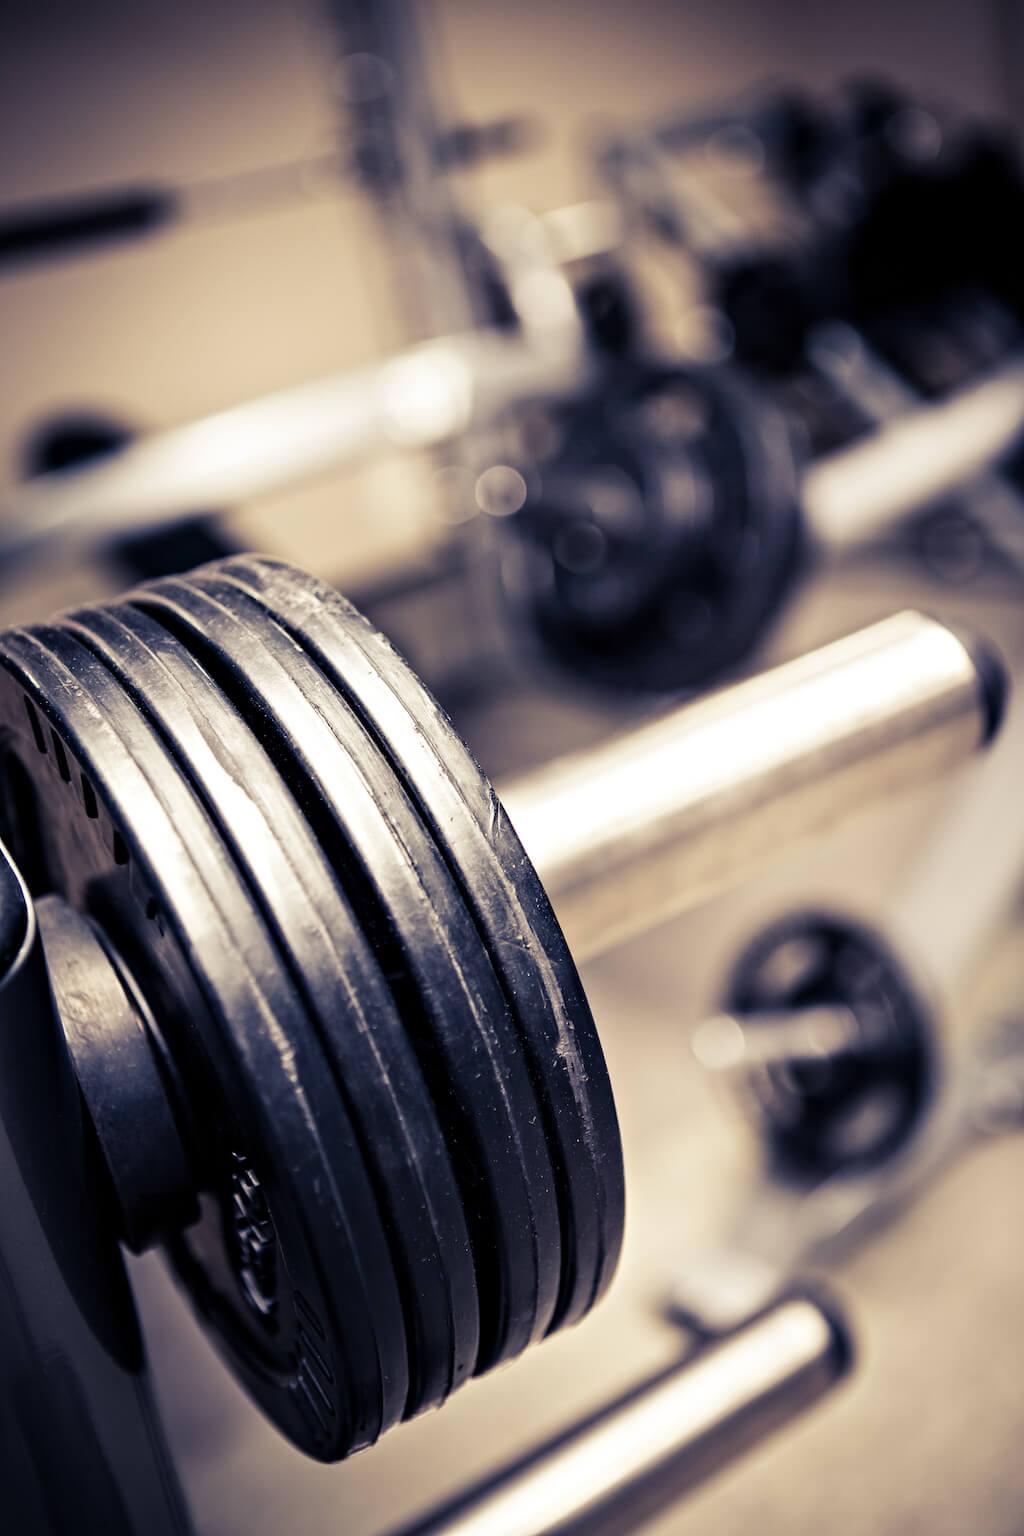 Muskelaufbau bei Frauen | Muskeln bei Frauen | Strong woman